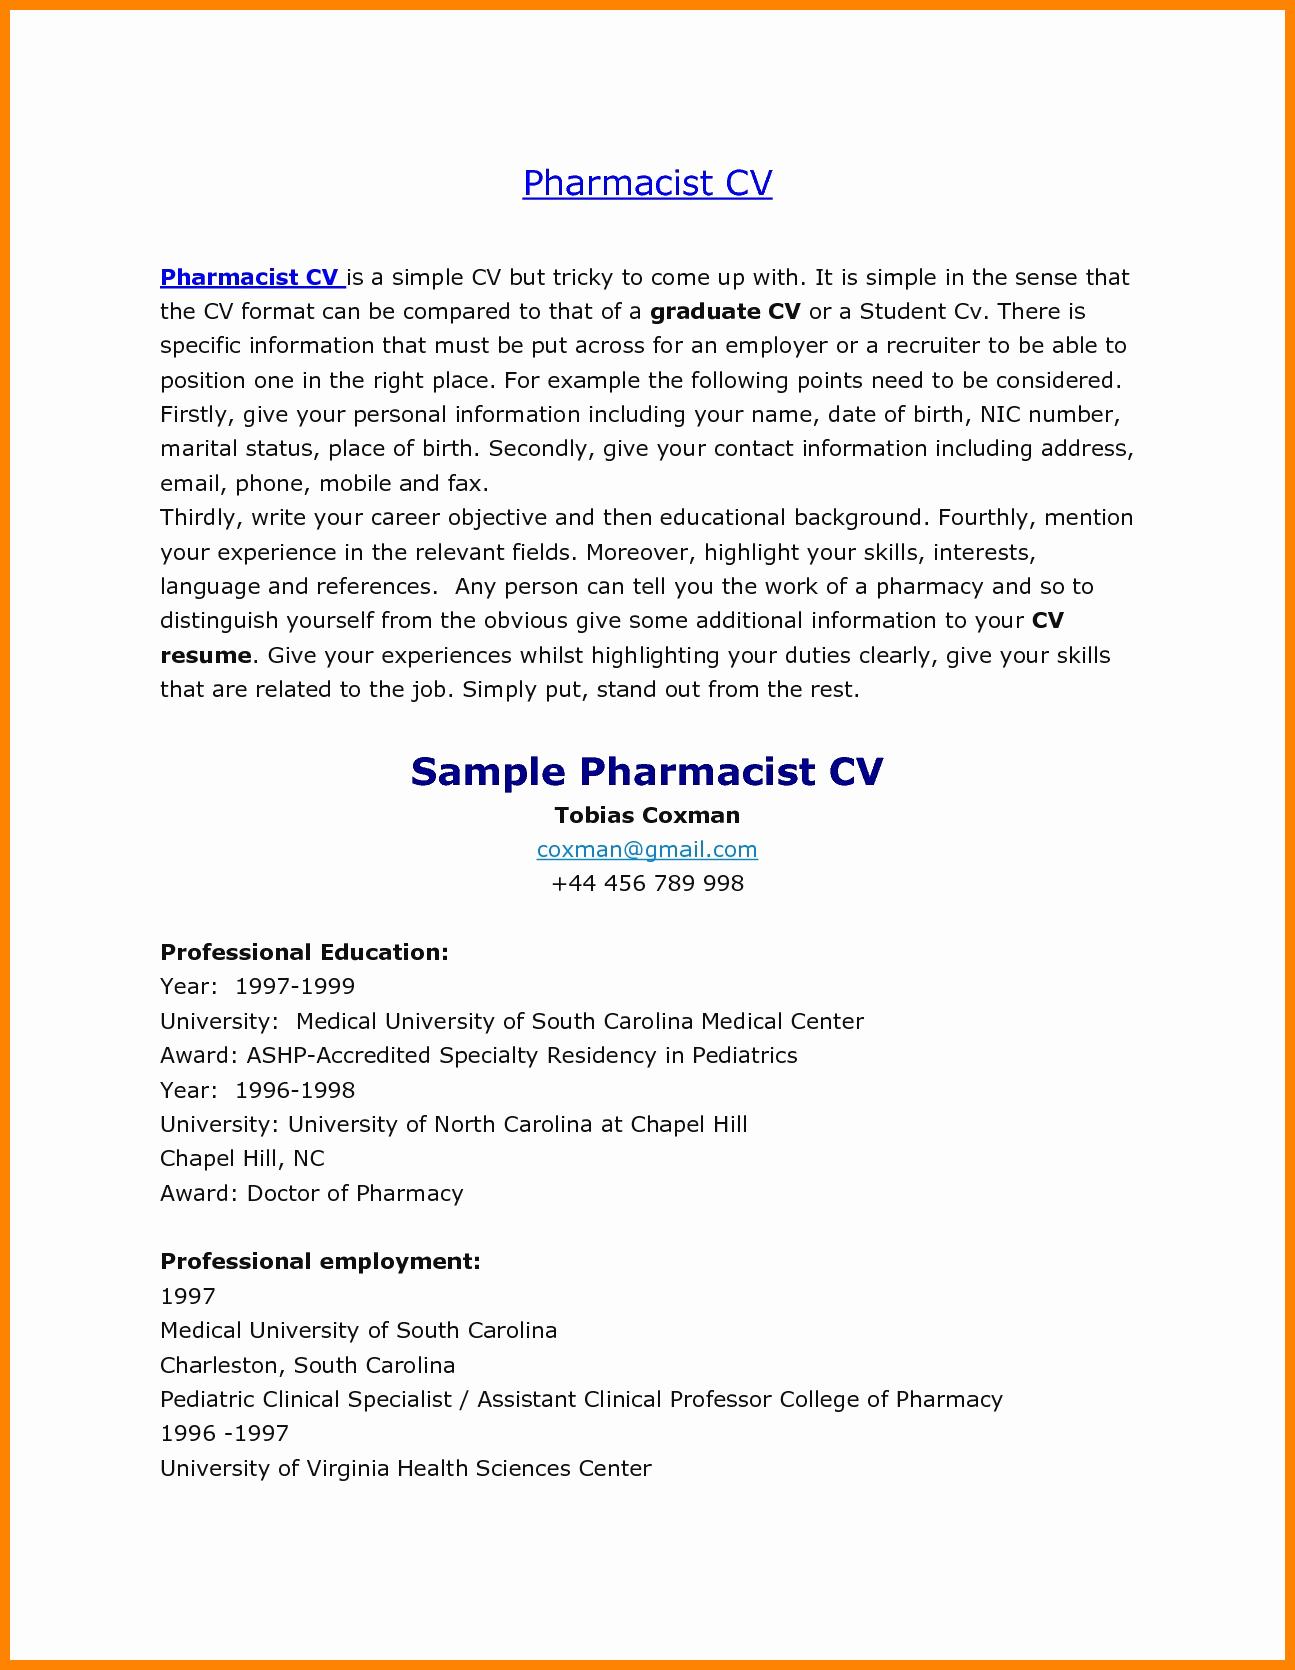 Pharmacist Curriculum Vitae Examples Beautiful 6 Cv Samples for Pharmacists